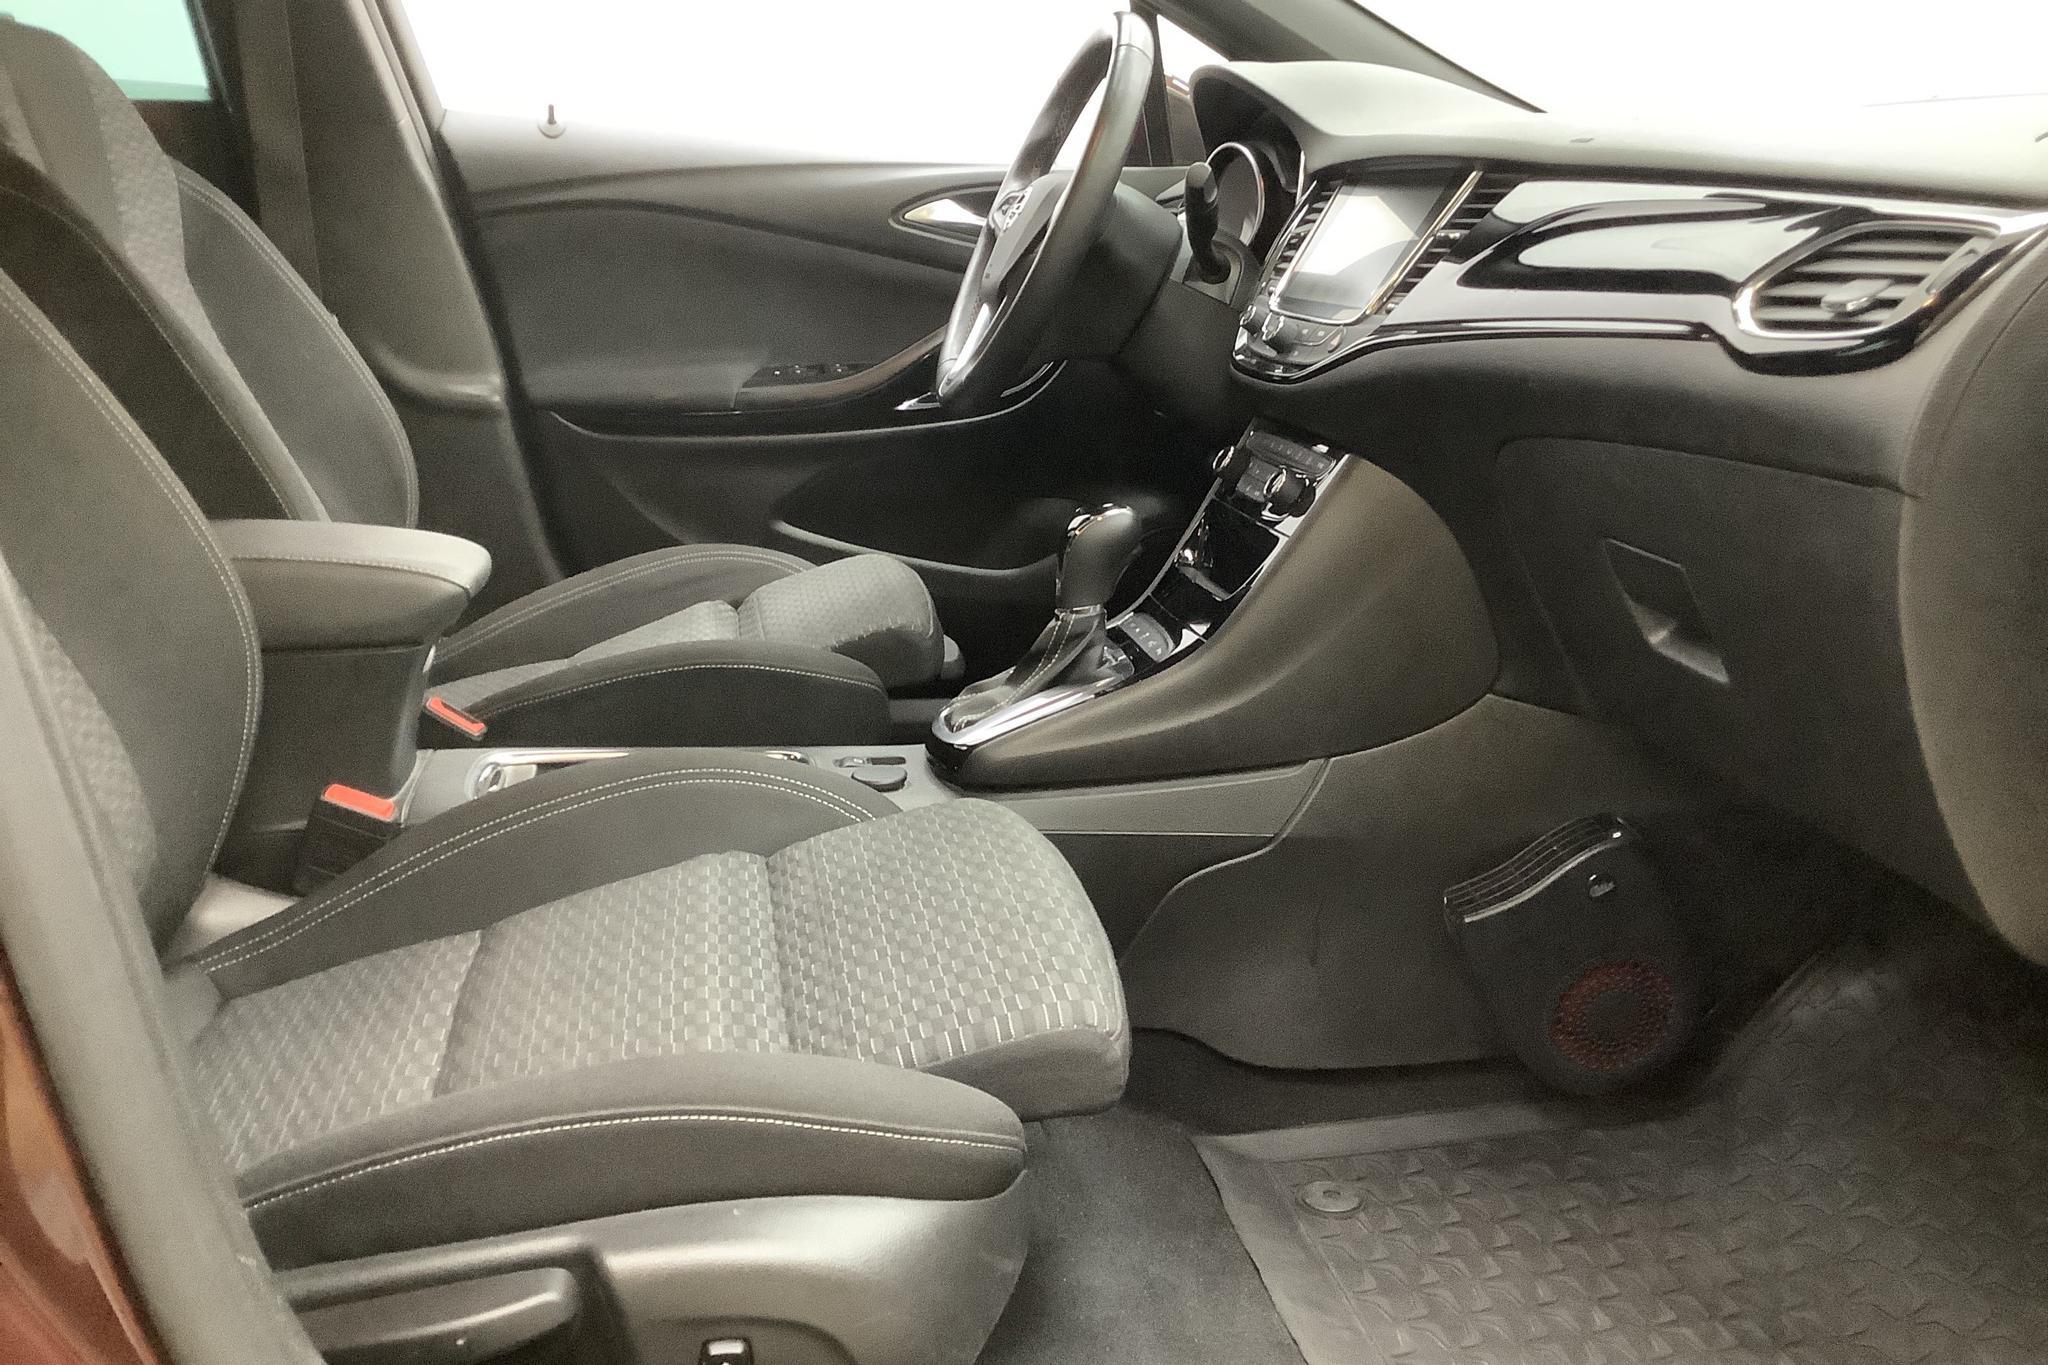 Opel Astra 1.4 Turbo ECOTEC SportsTourer (150hk) - 4 614 mil - Automat - röd - 2018